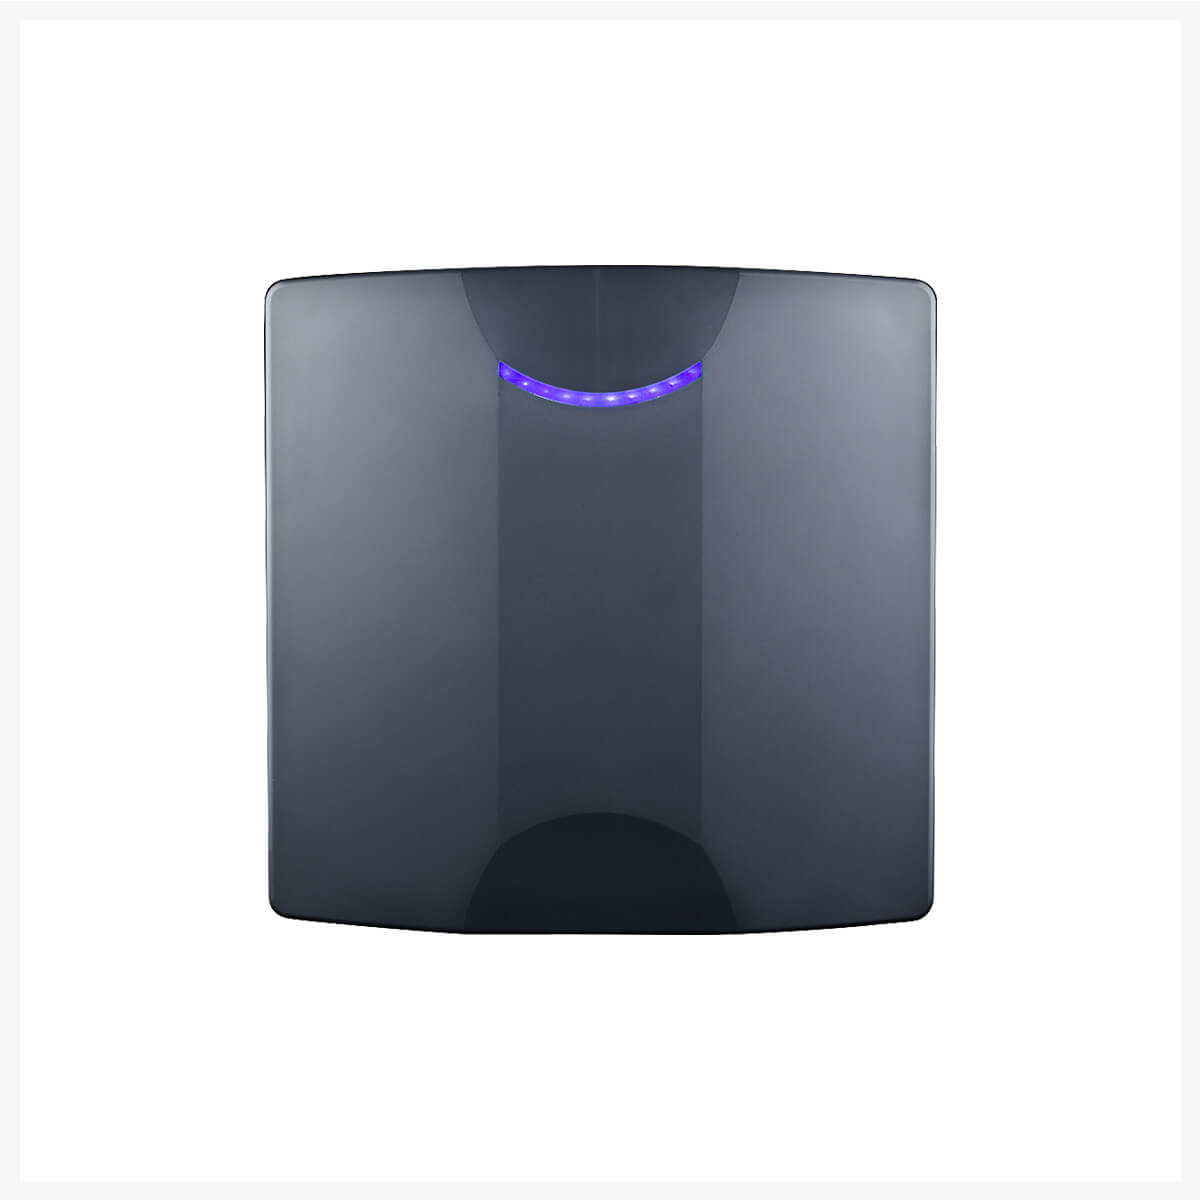 Nedap-Long-range-UHF-Reader---uPASS-Target